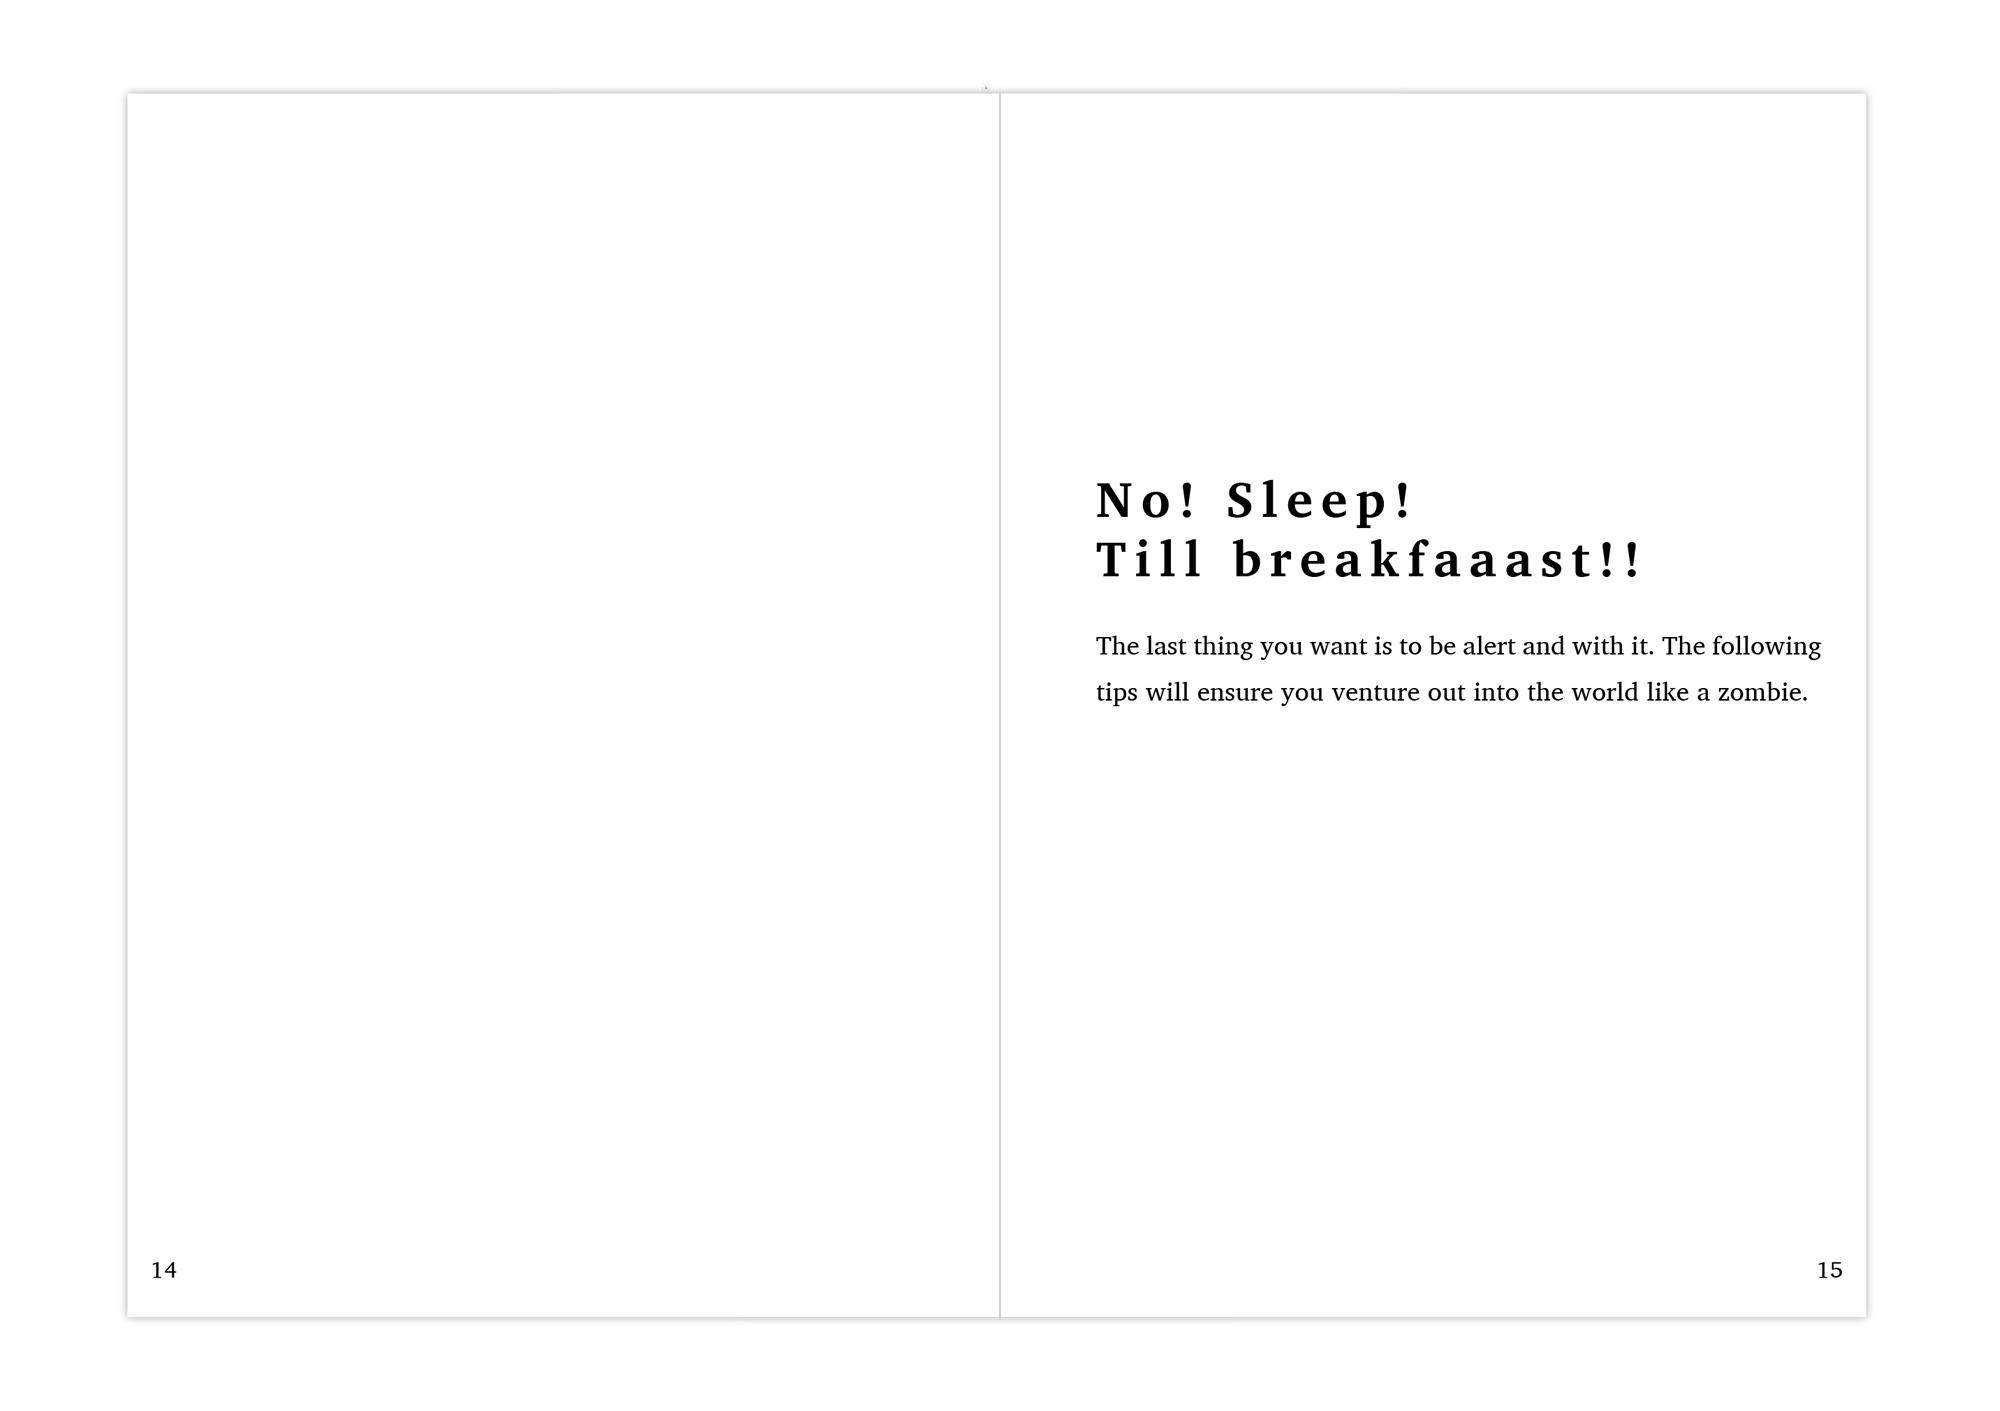 DG-spread-no sleep.jpg